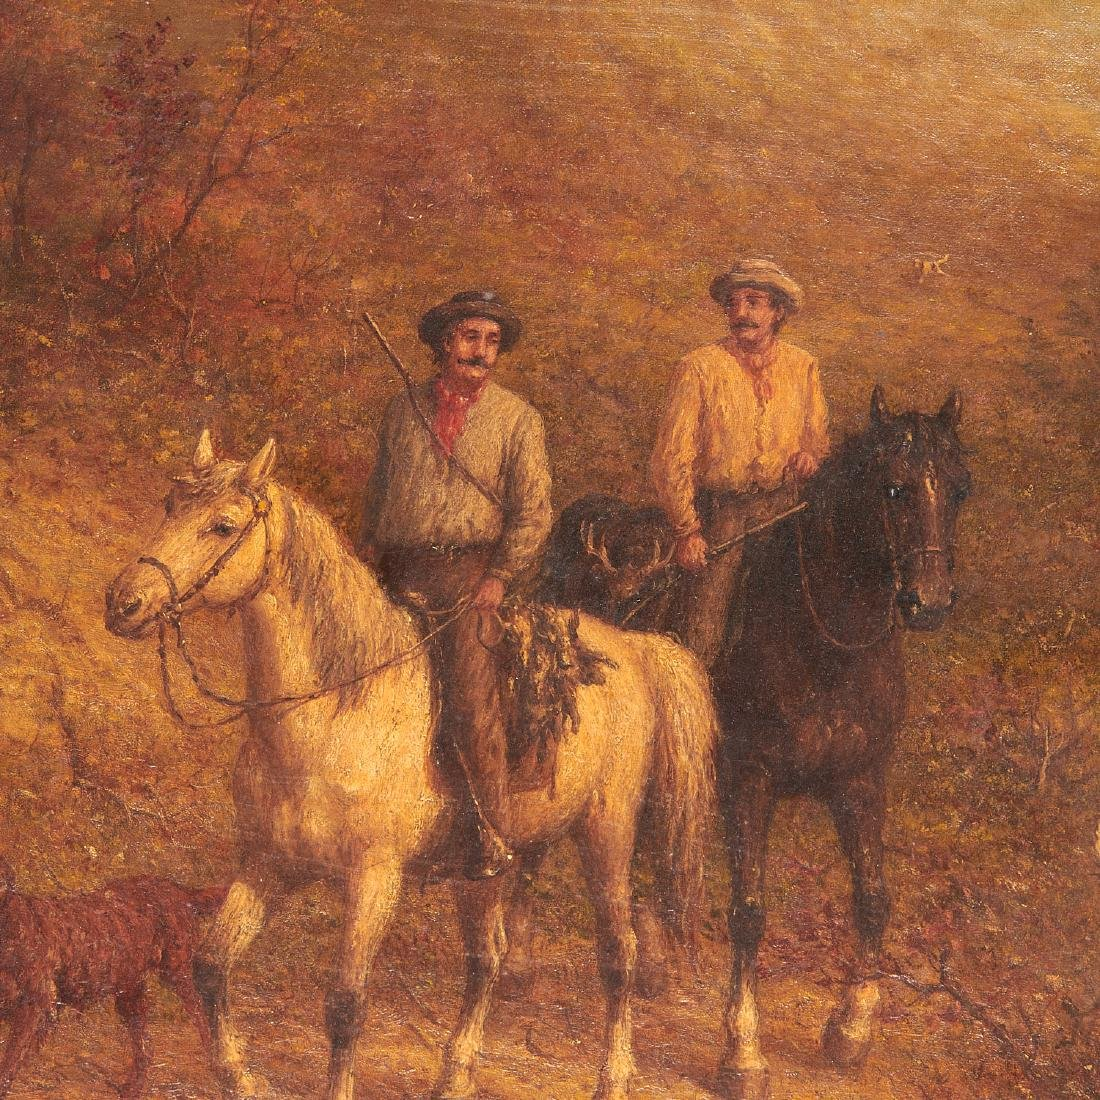 George Riecke, painting - 2